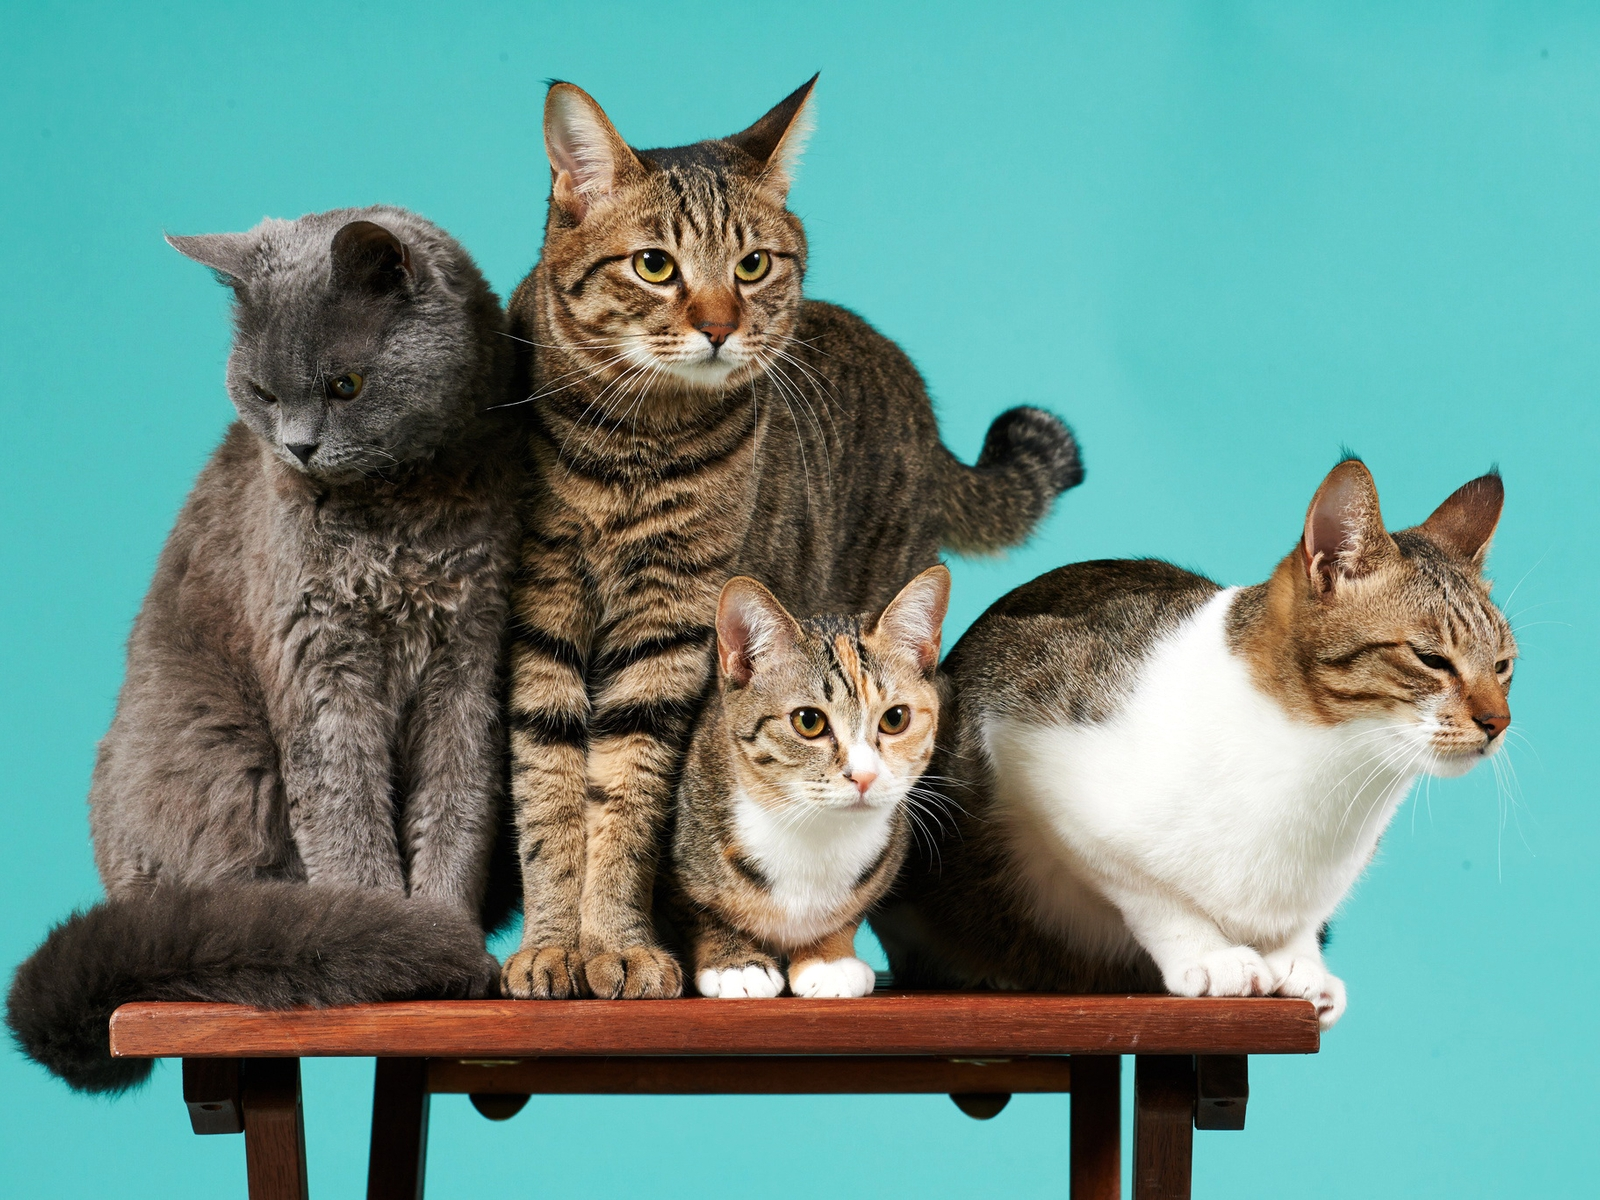 Картинка: Кошки, много, четыре, стол, фон